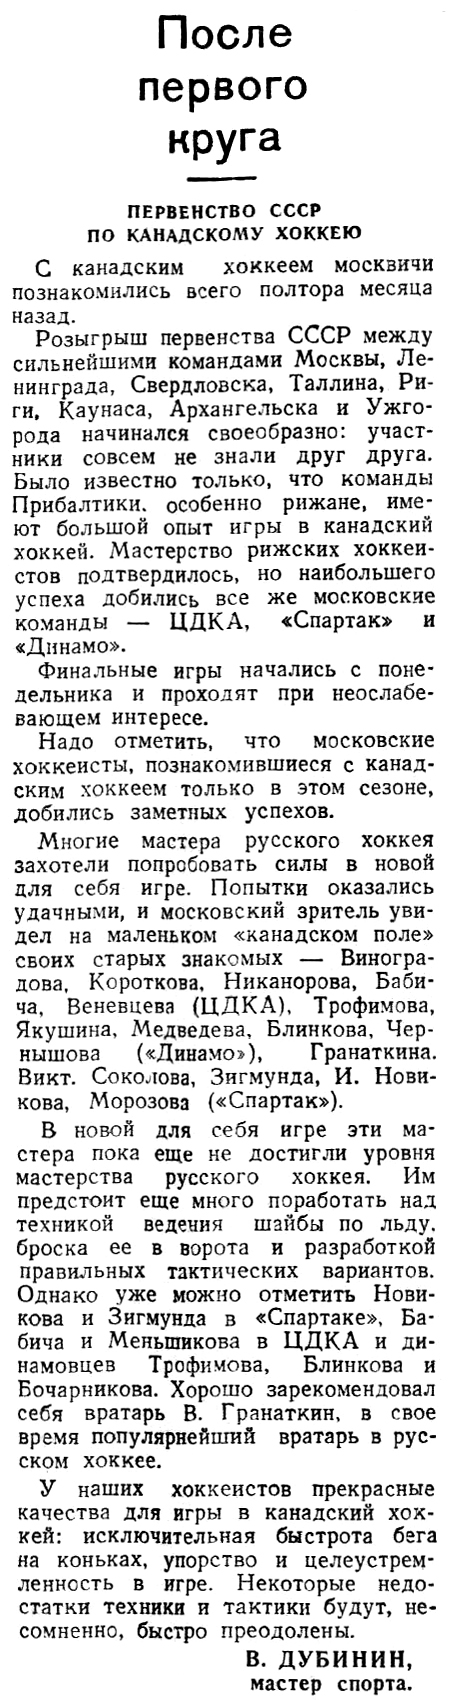 ВМ 1947-01-25-01.jpg